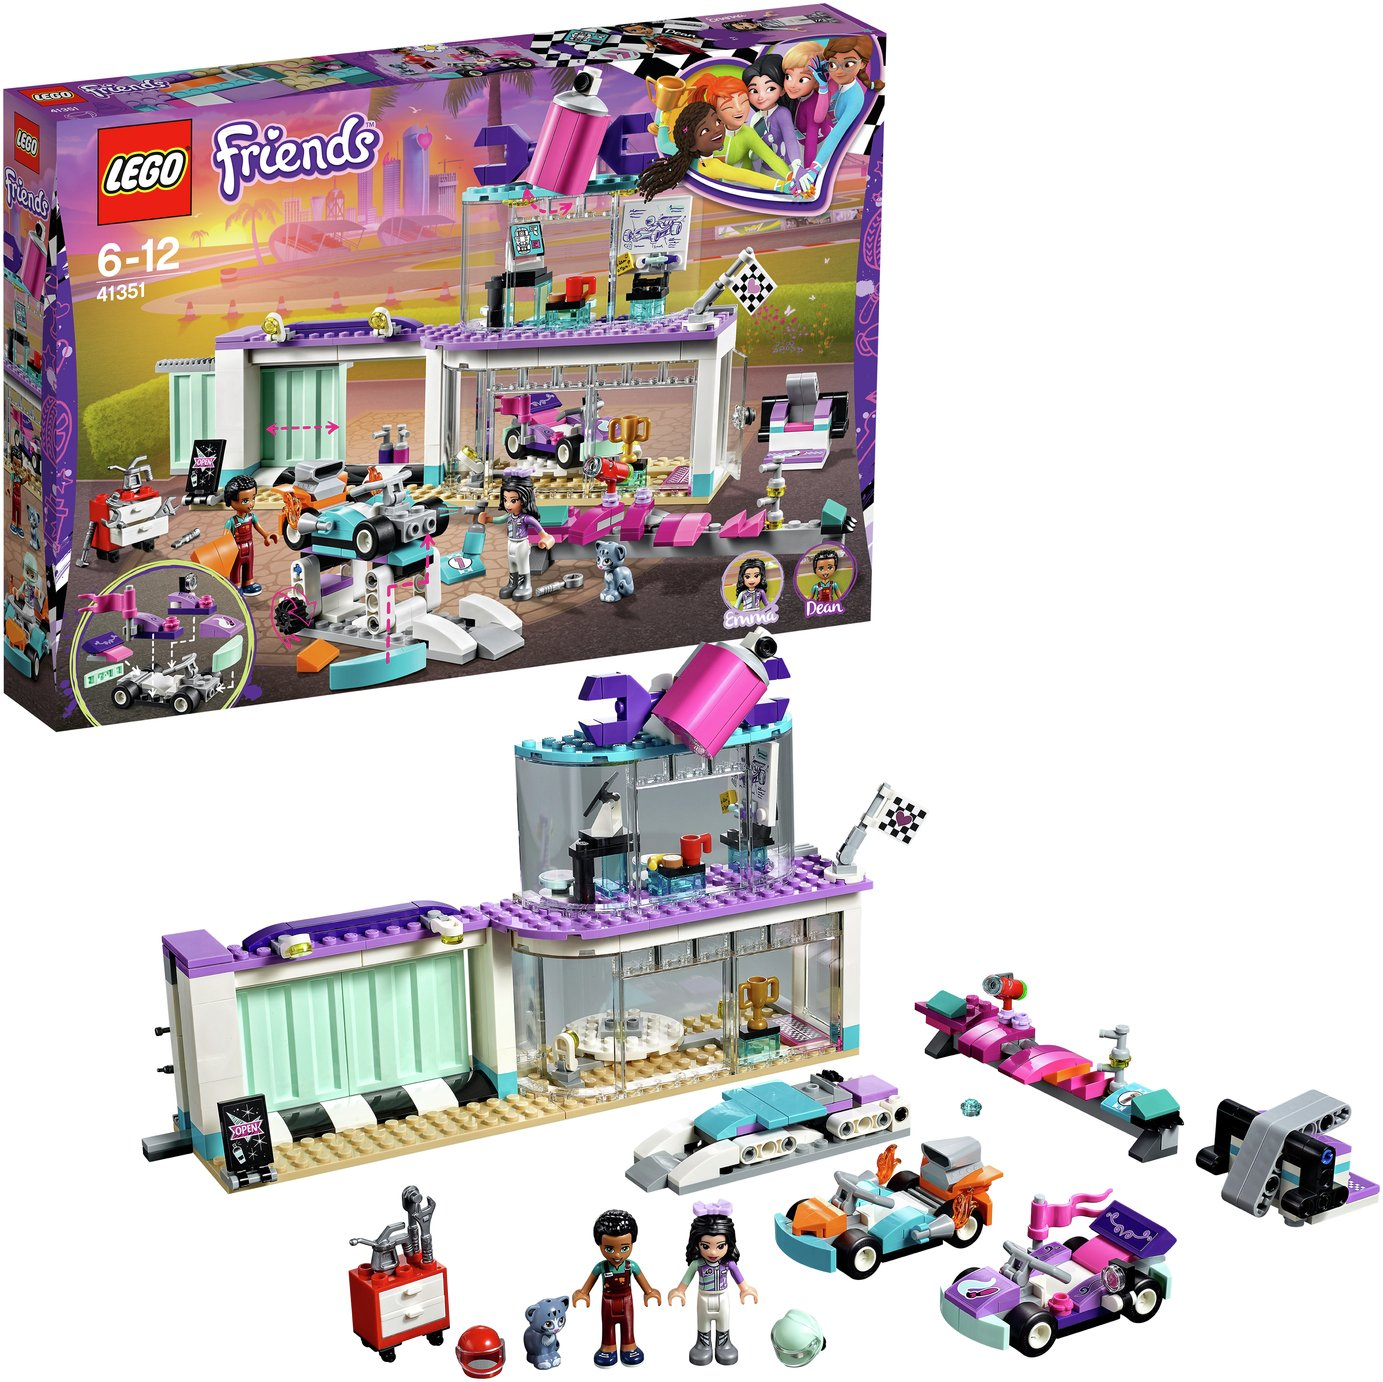 LEGO Friends Heartlake Creative Tuning Shop Playset - 41351